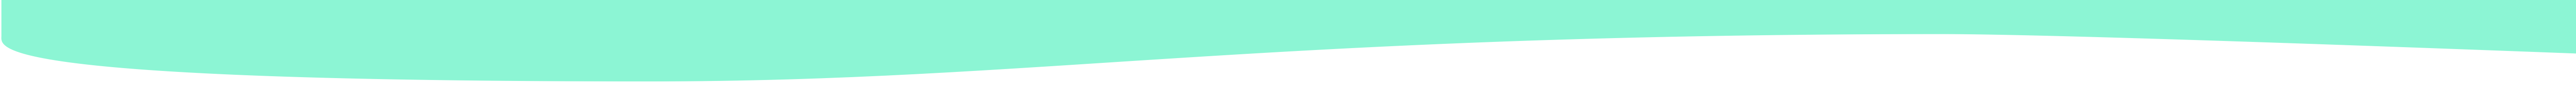 teal-curve